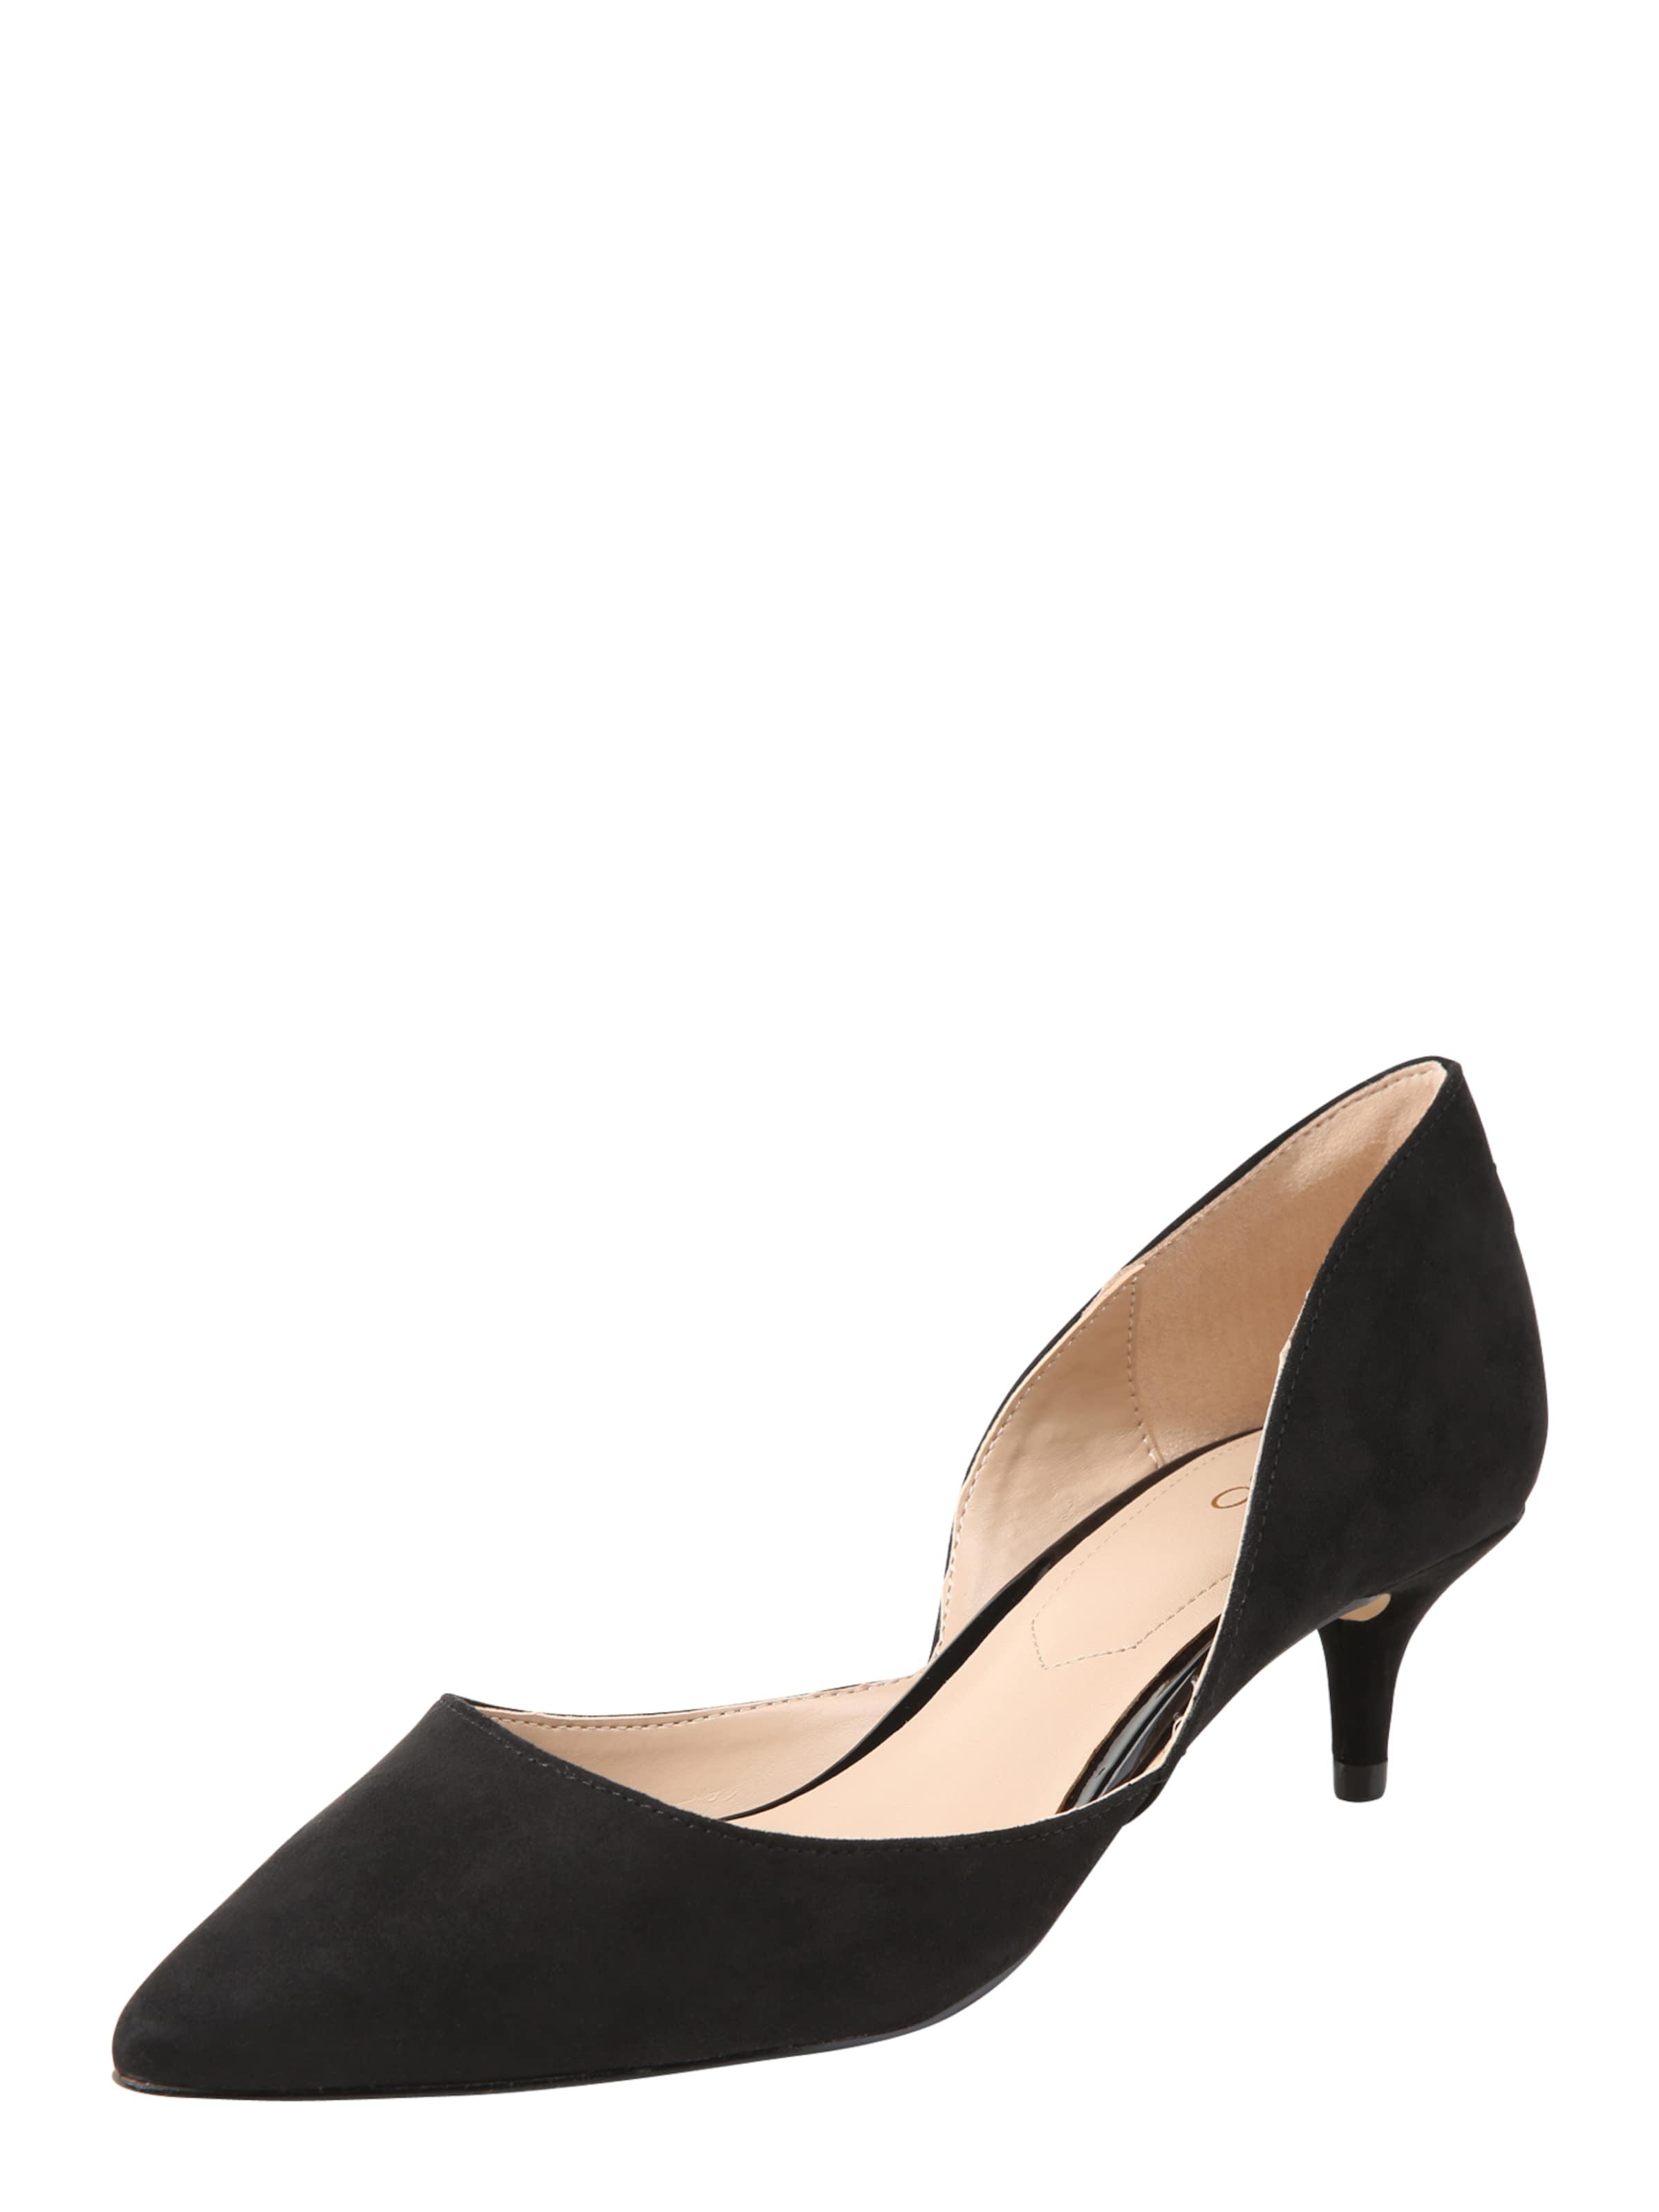 Haltbare Mode billige Schuhe ALDO | Pumps 'ADYLIA' Schuhe Gut getragene Schuhe